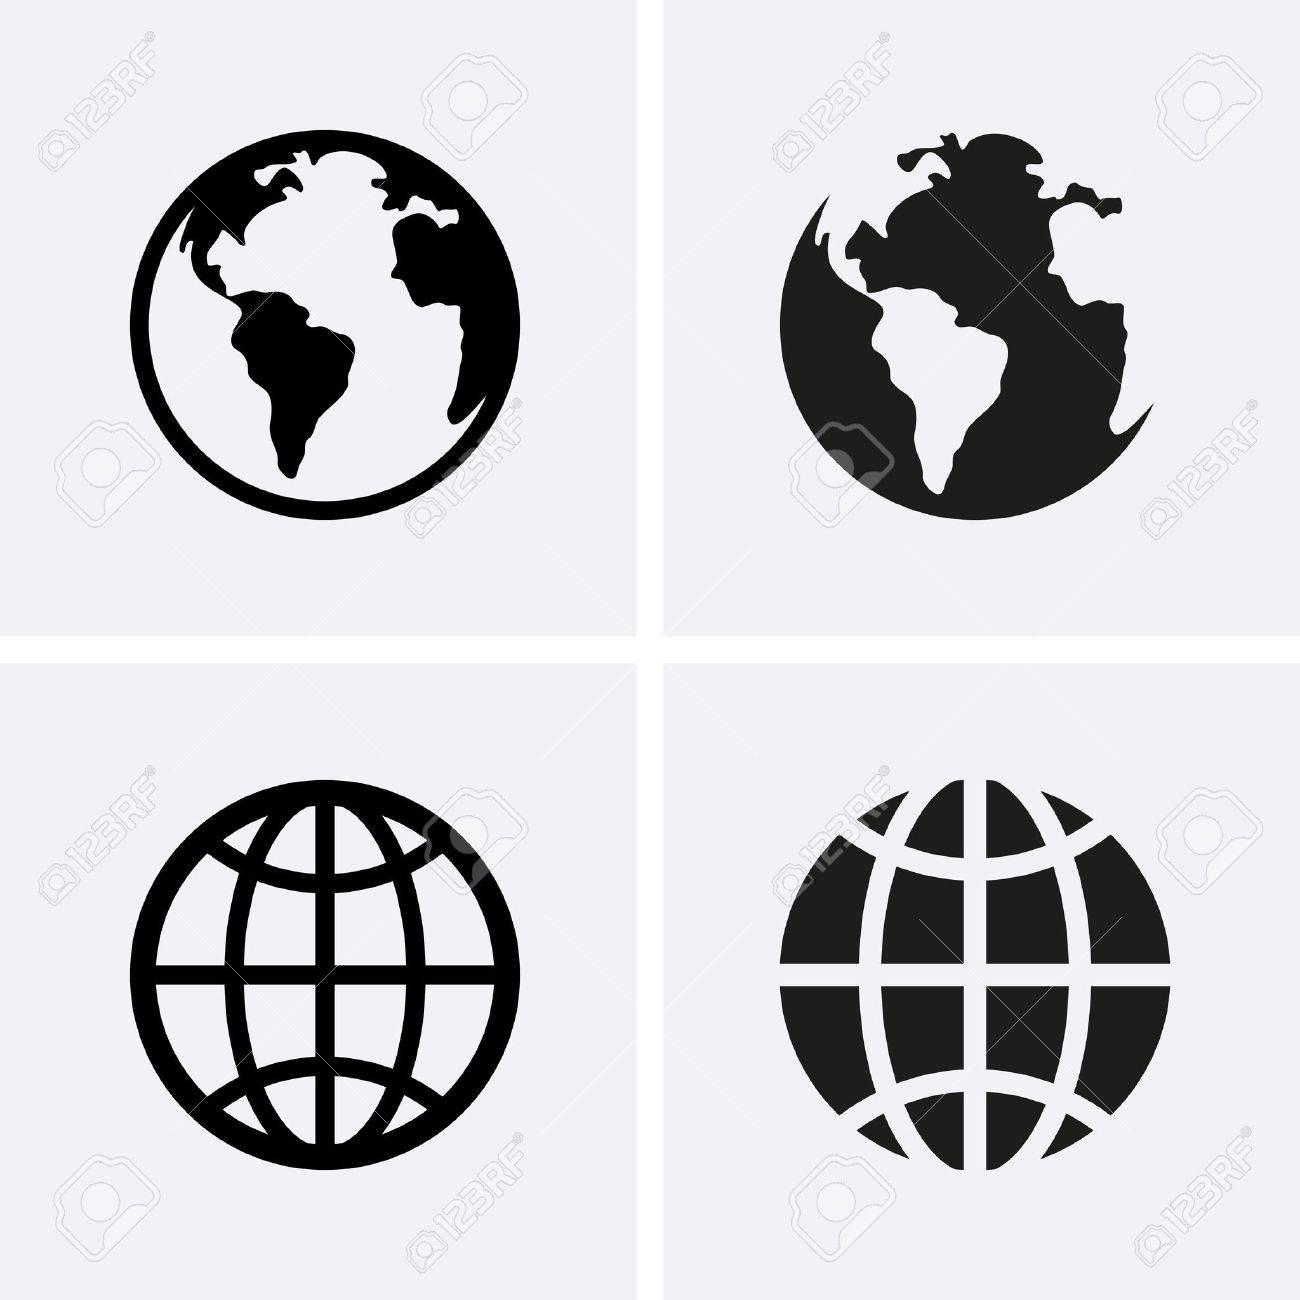 439597 world icon cliparts stock vector and royalty free world earth globe icons vector publicscrutiny Choice Image